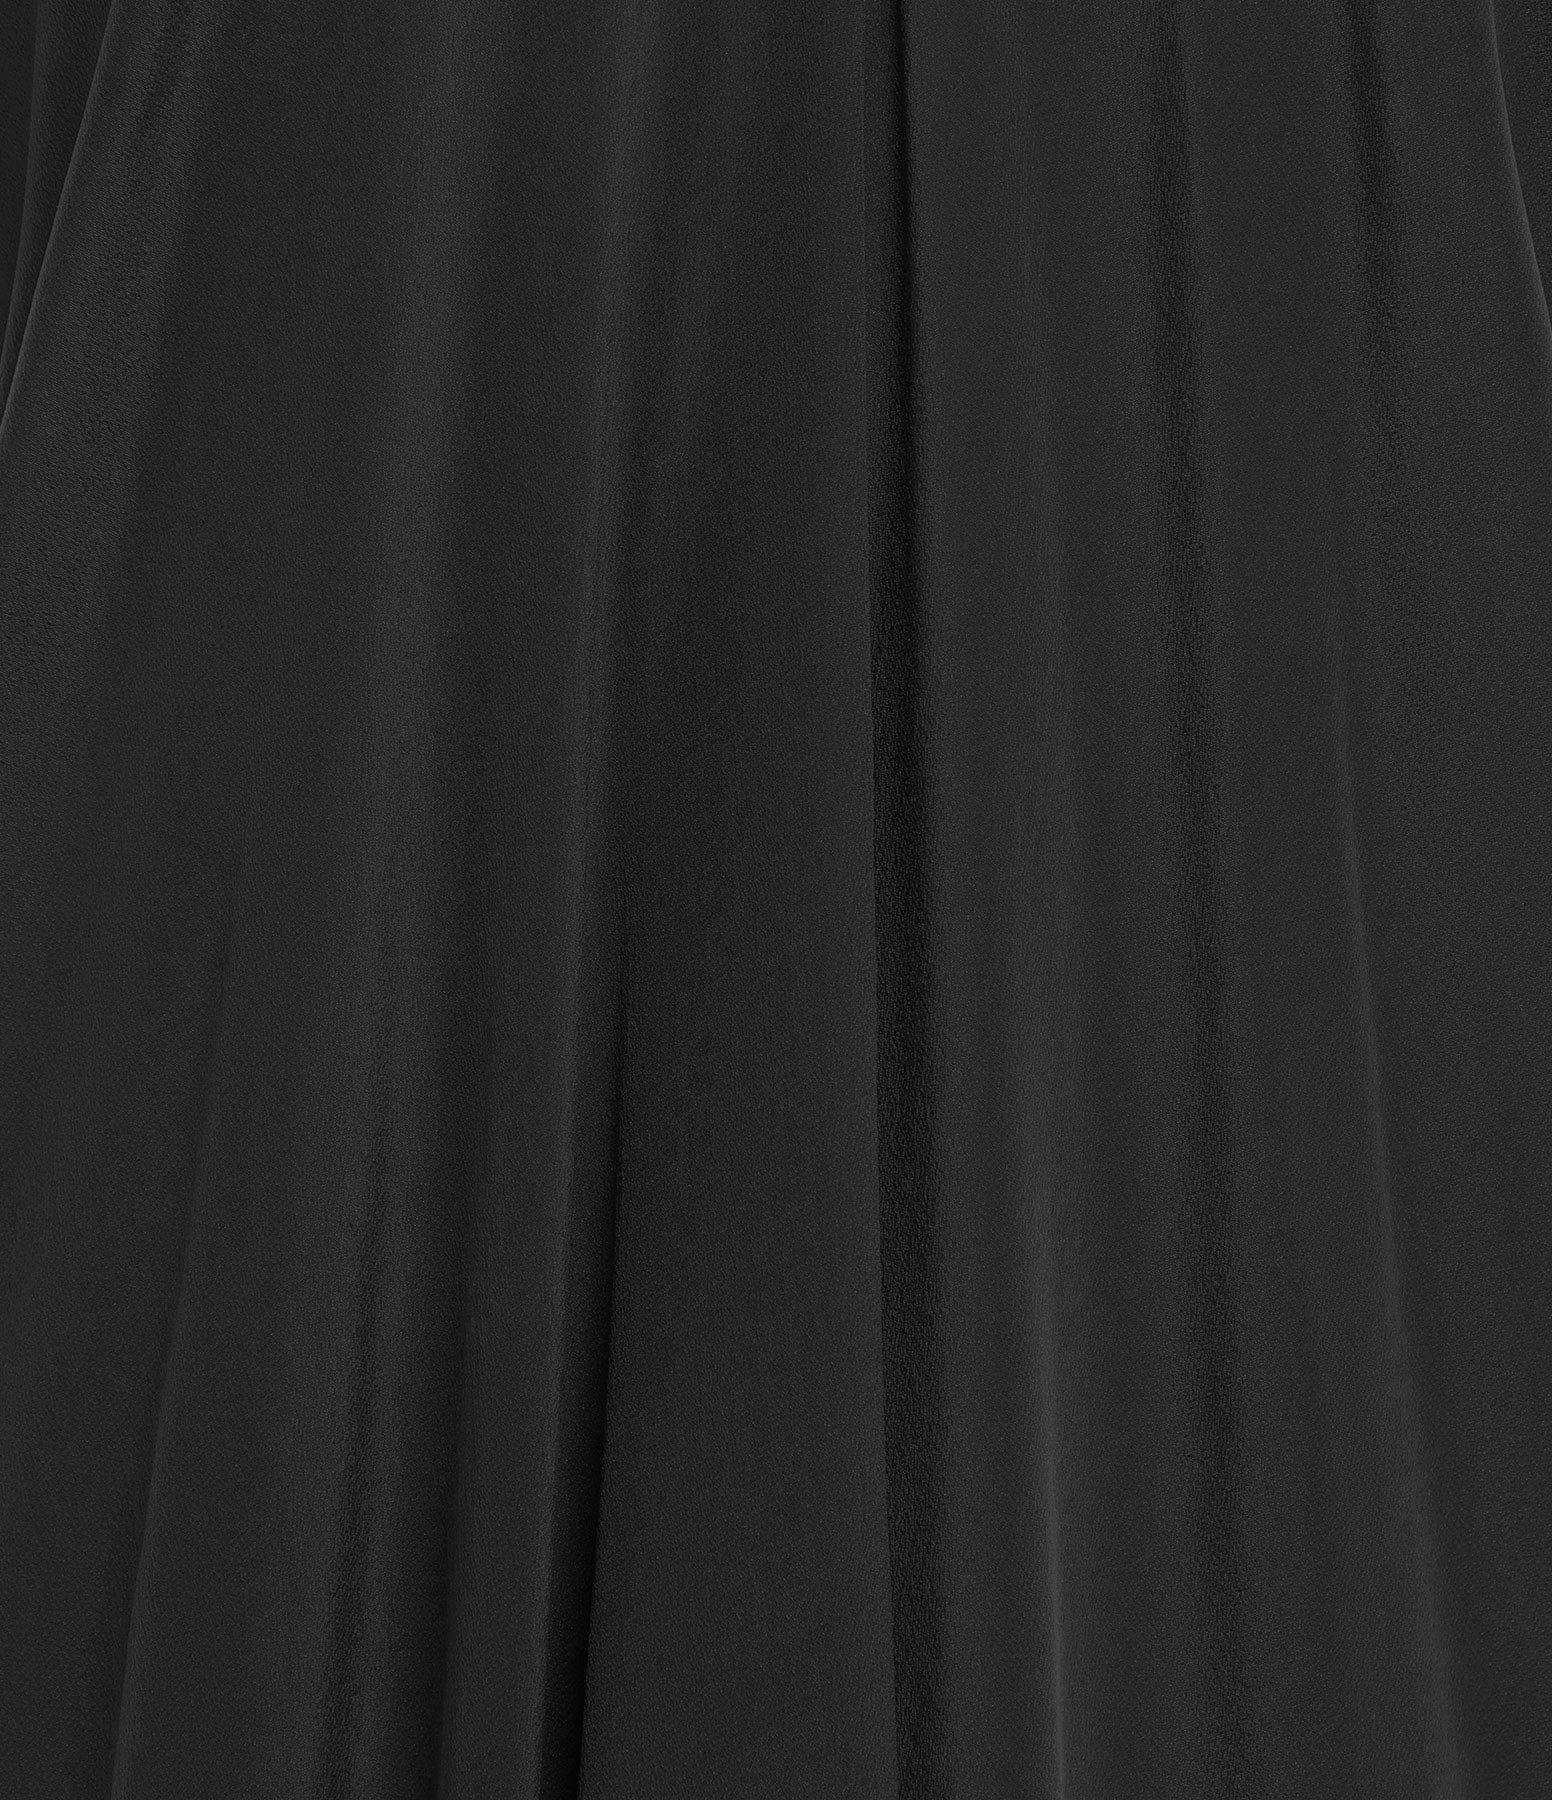 MARE DI LATTE - Robe Tabata Crêpe Soie Noir